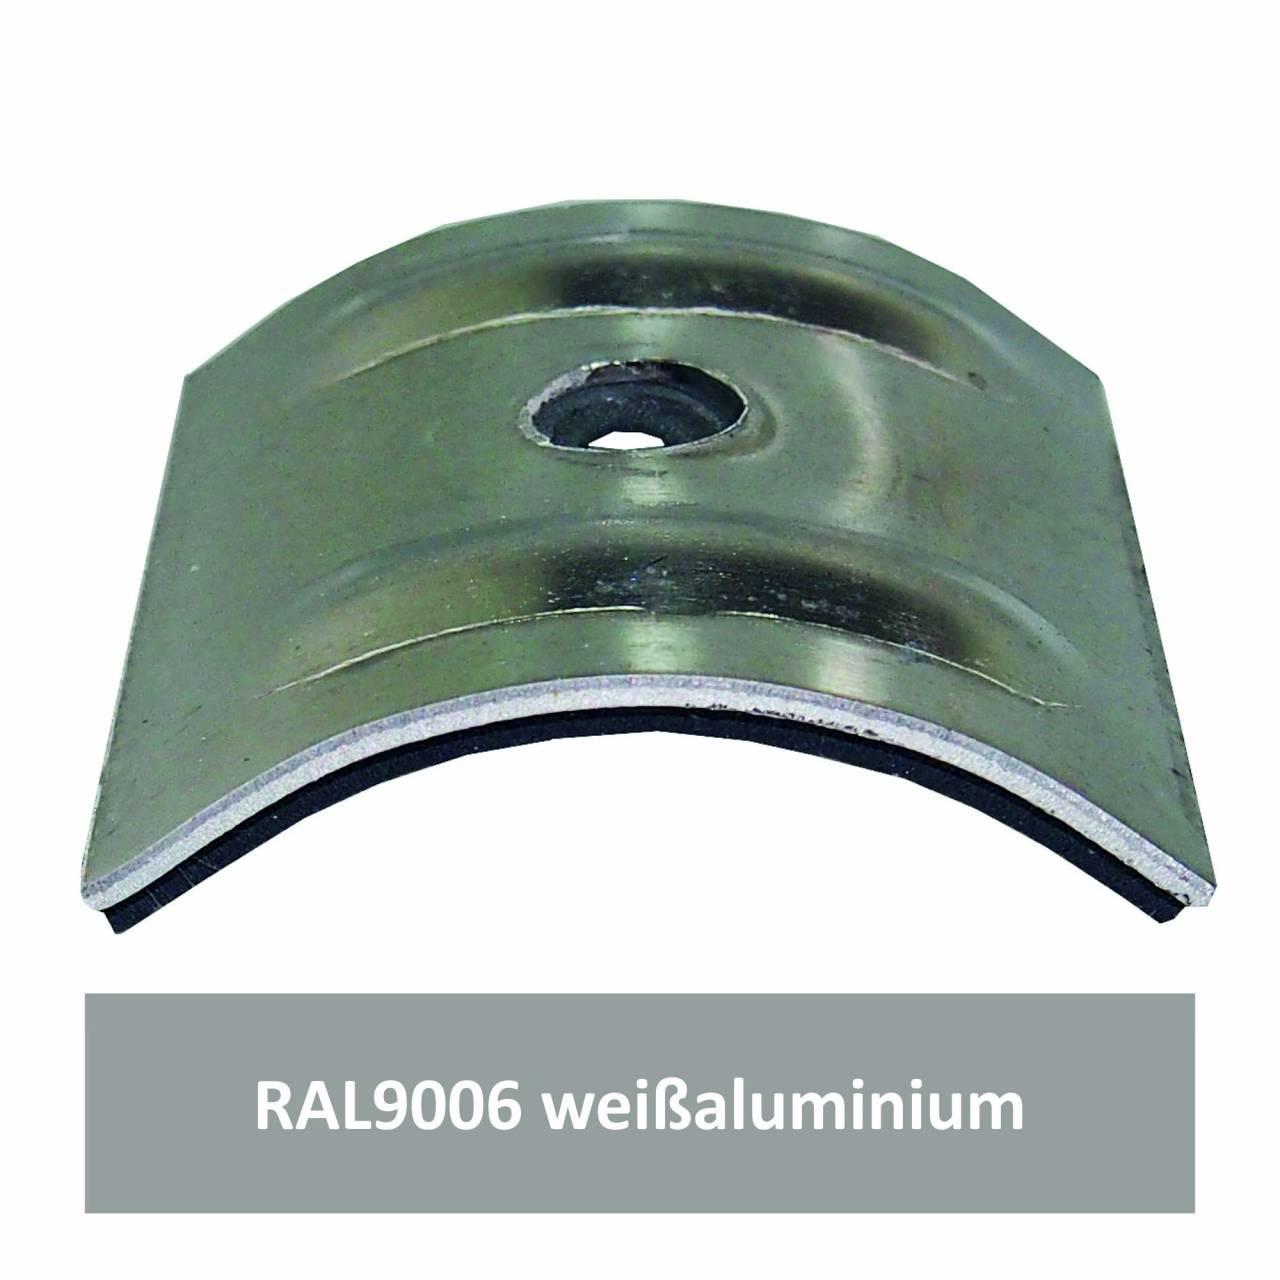 Kalotten für Welle 18/76, Alu RAL9006 weißaluminium / Pck a 100 Stück